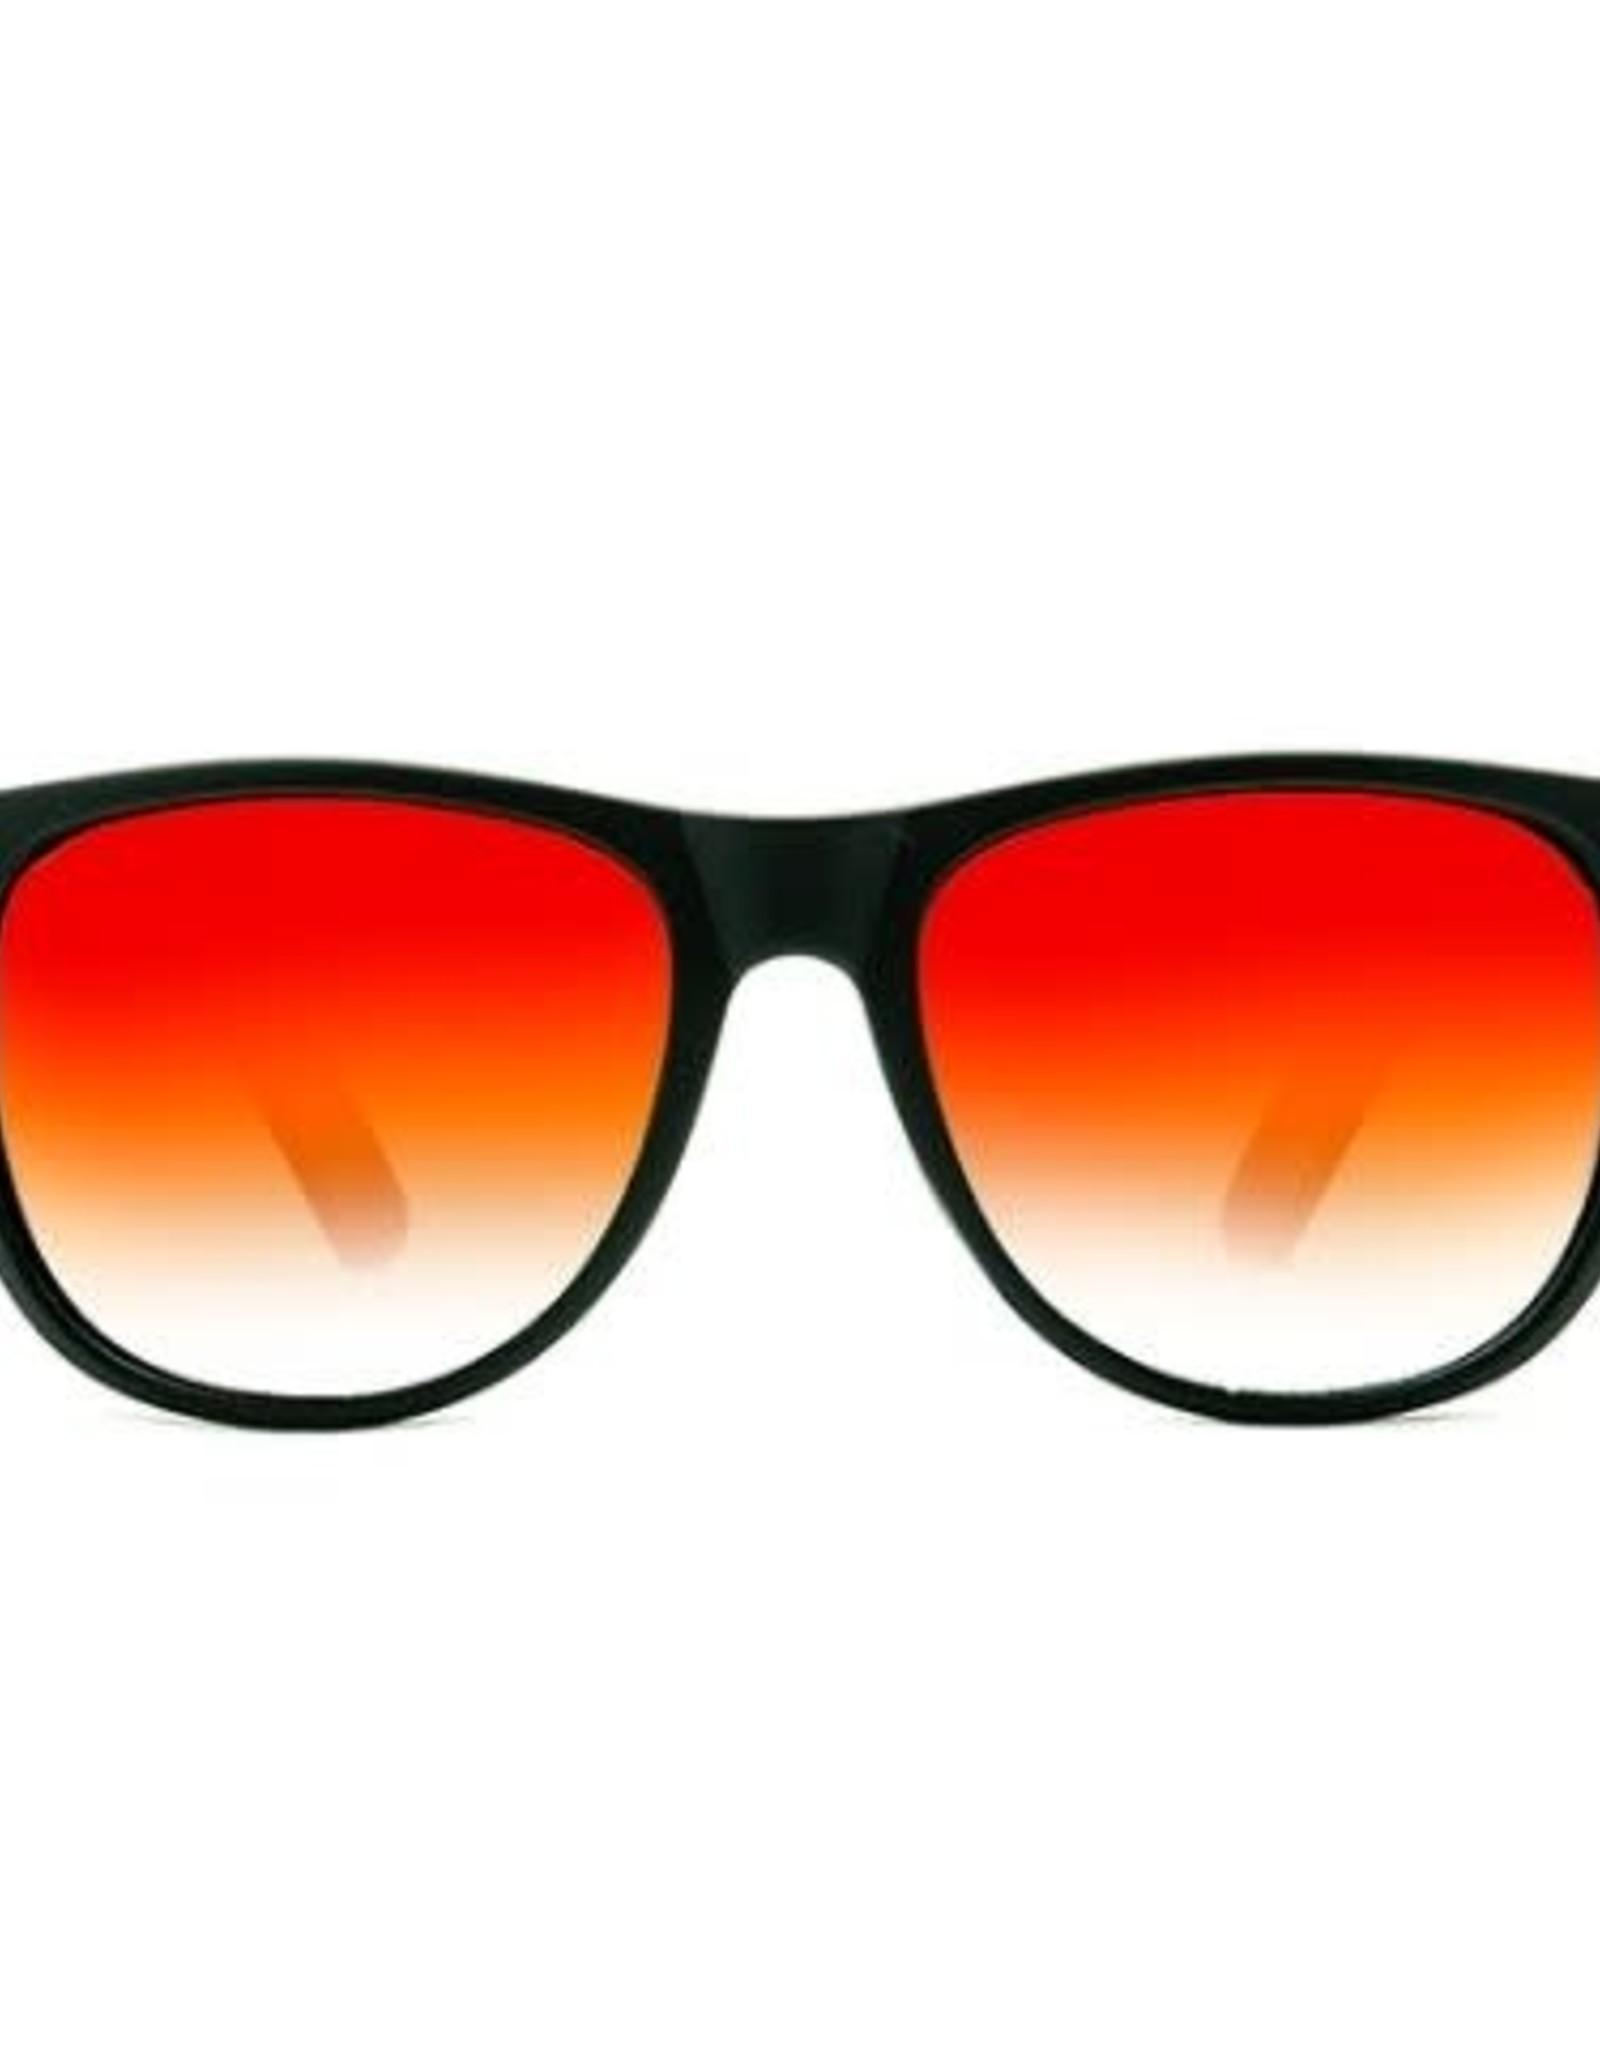 Blade Shades Blade Shades Pro Series Sunglasses (Detroit)